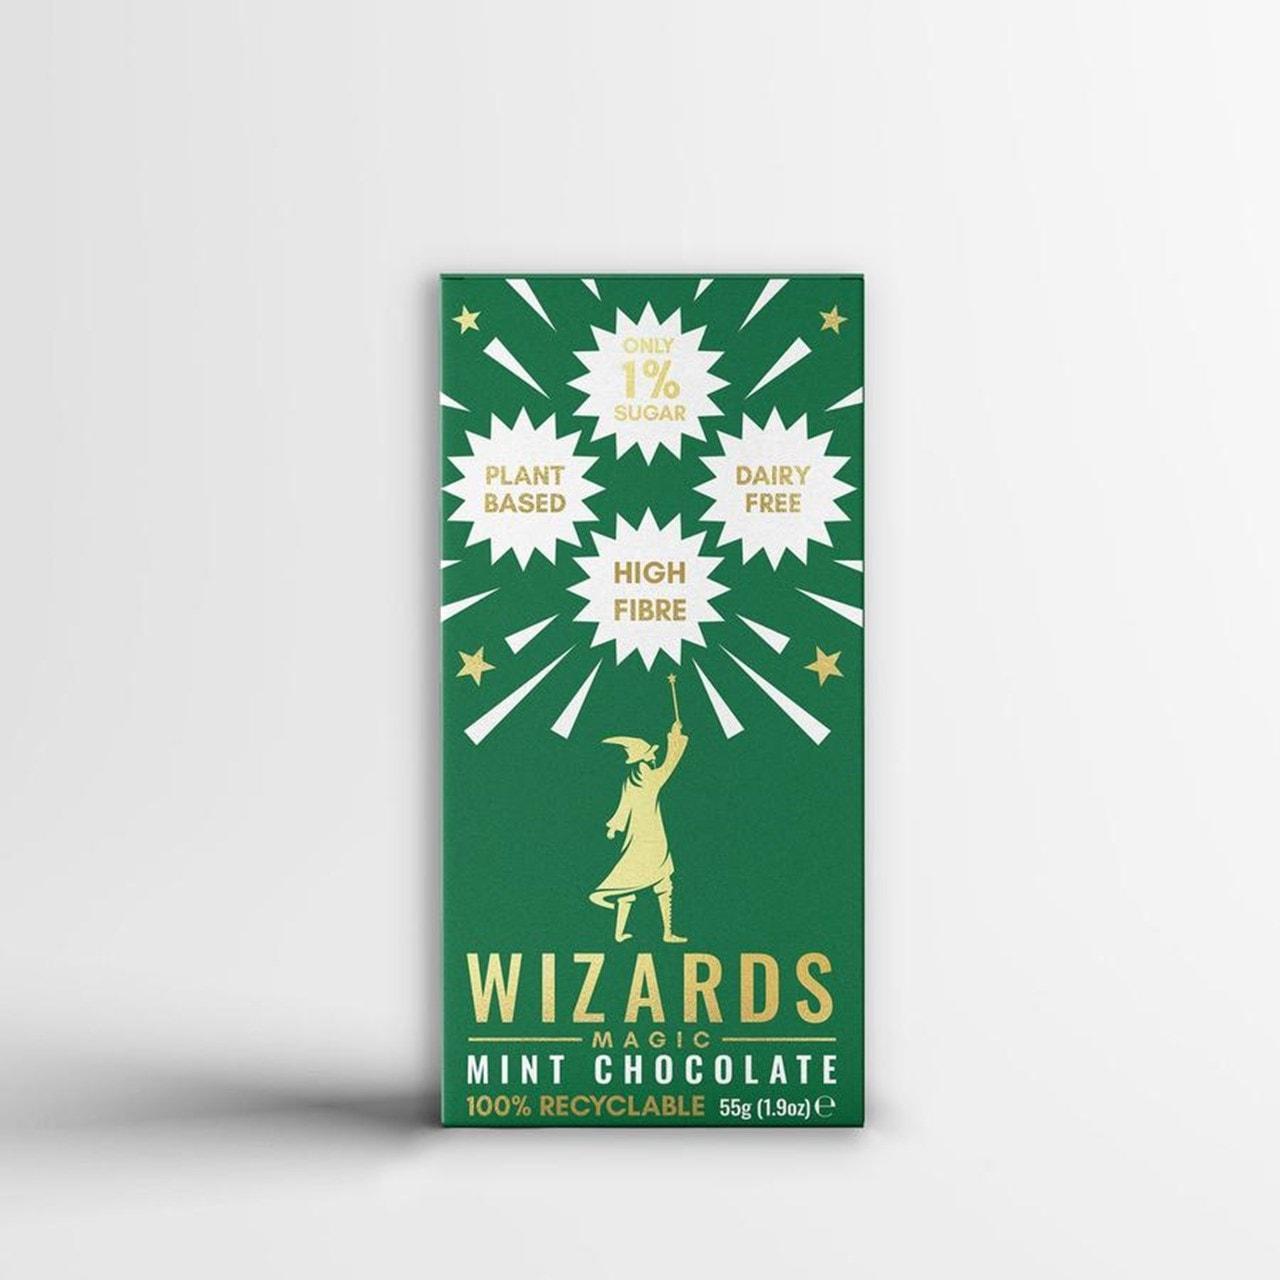 Wizards Magic Chocolate: 1% Sugar Original Gift Pack: Mint & Orange (Pack of 4) - 3